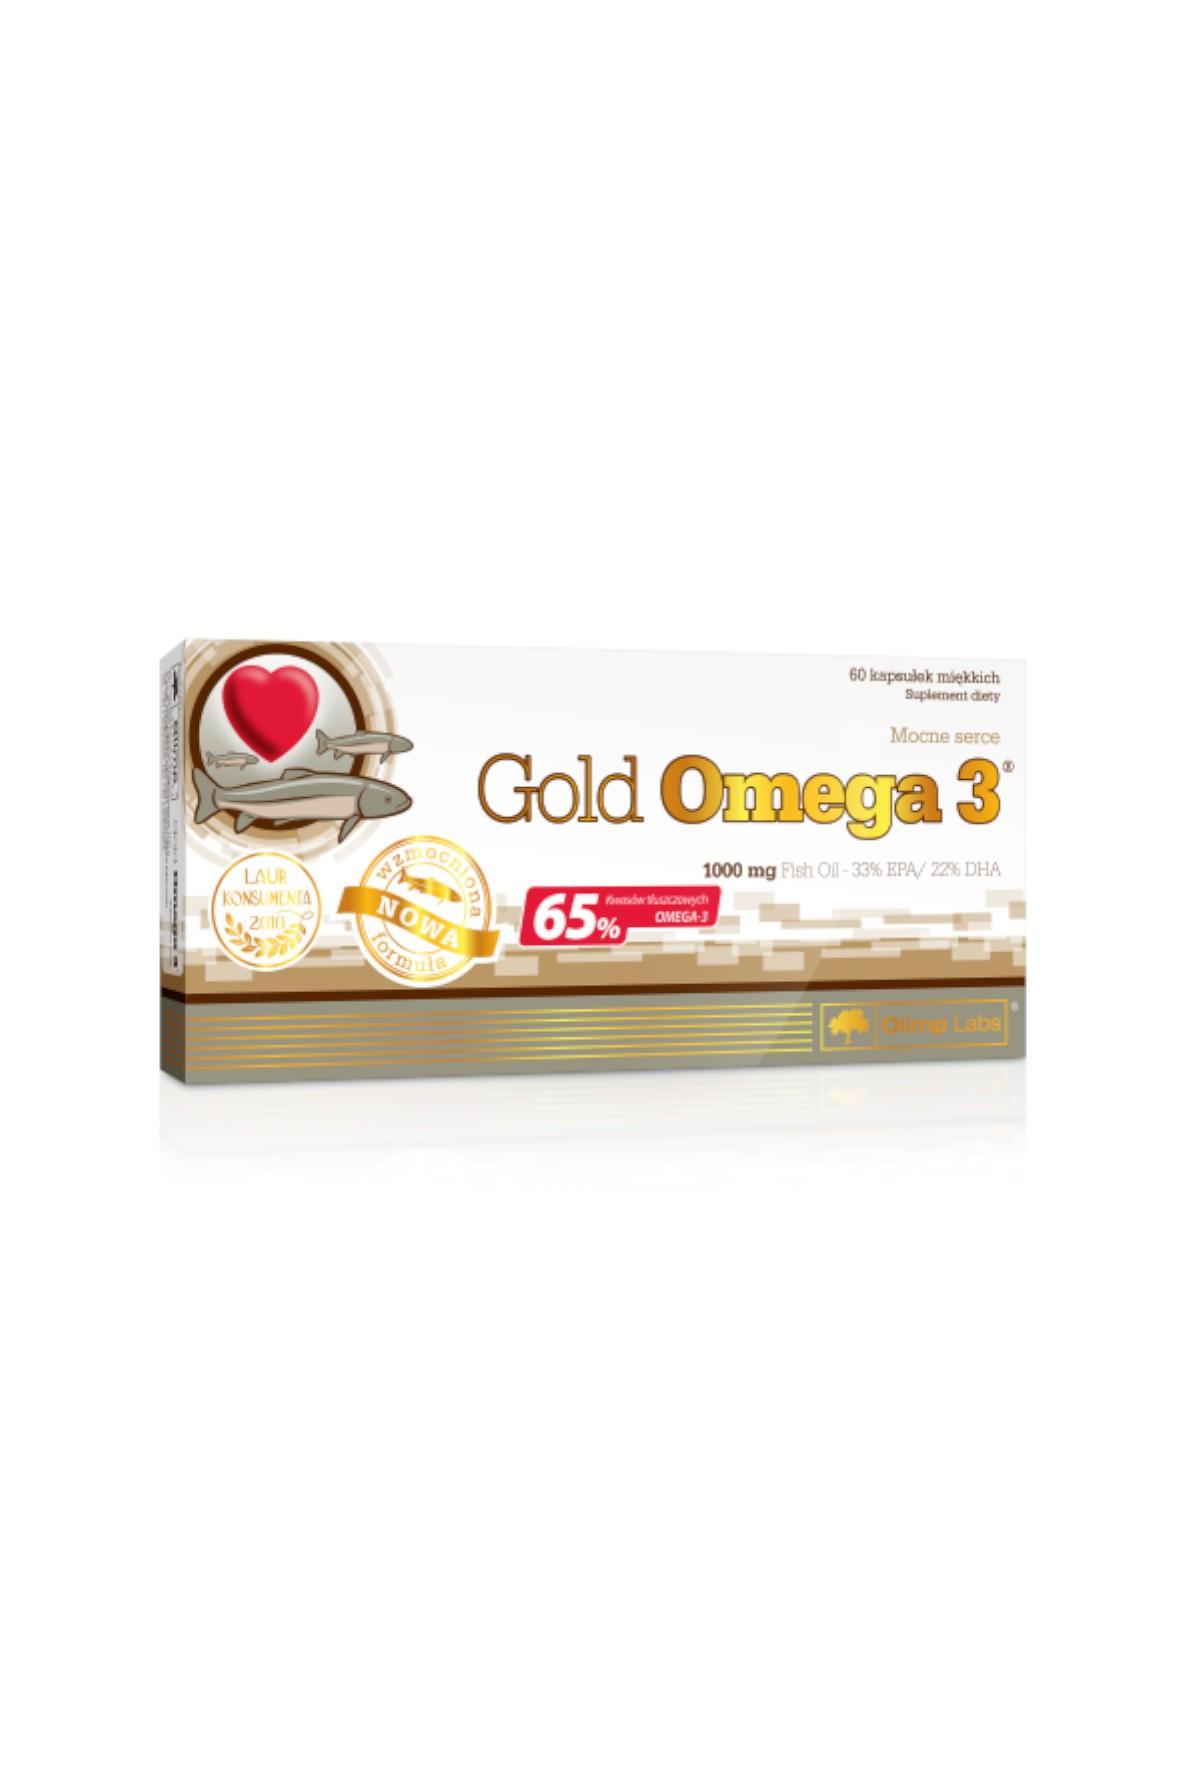 Gold Omega 3 60 kapsułek (65%)/1000 mg  TOP